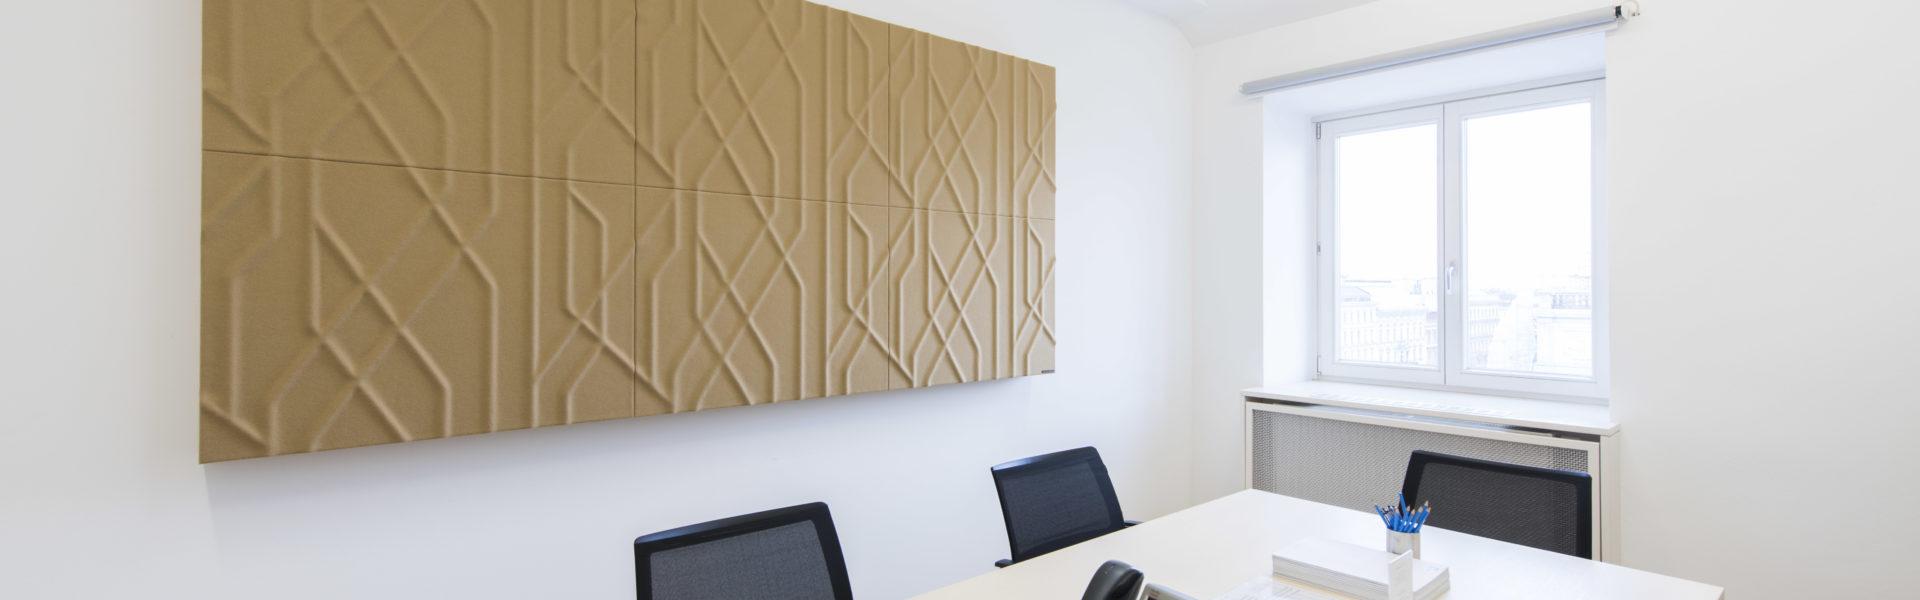 Soundcomb in Beige mit Muster